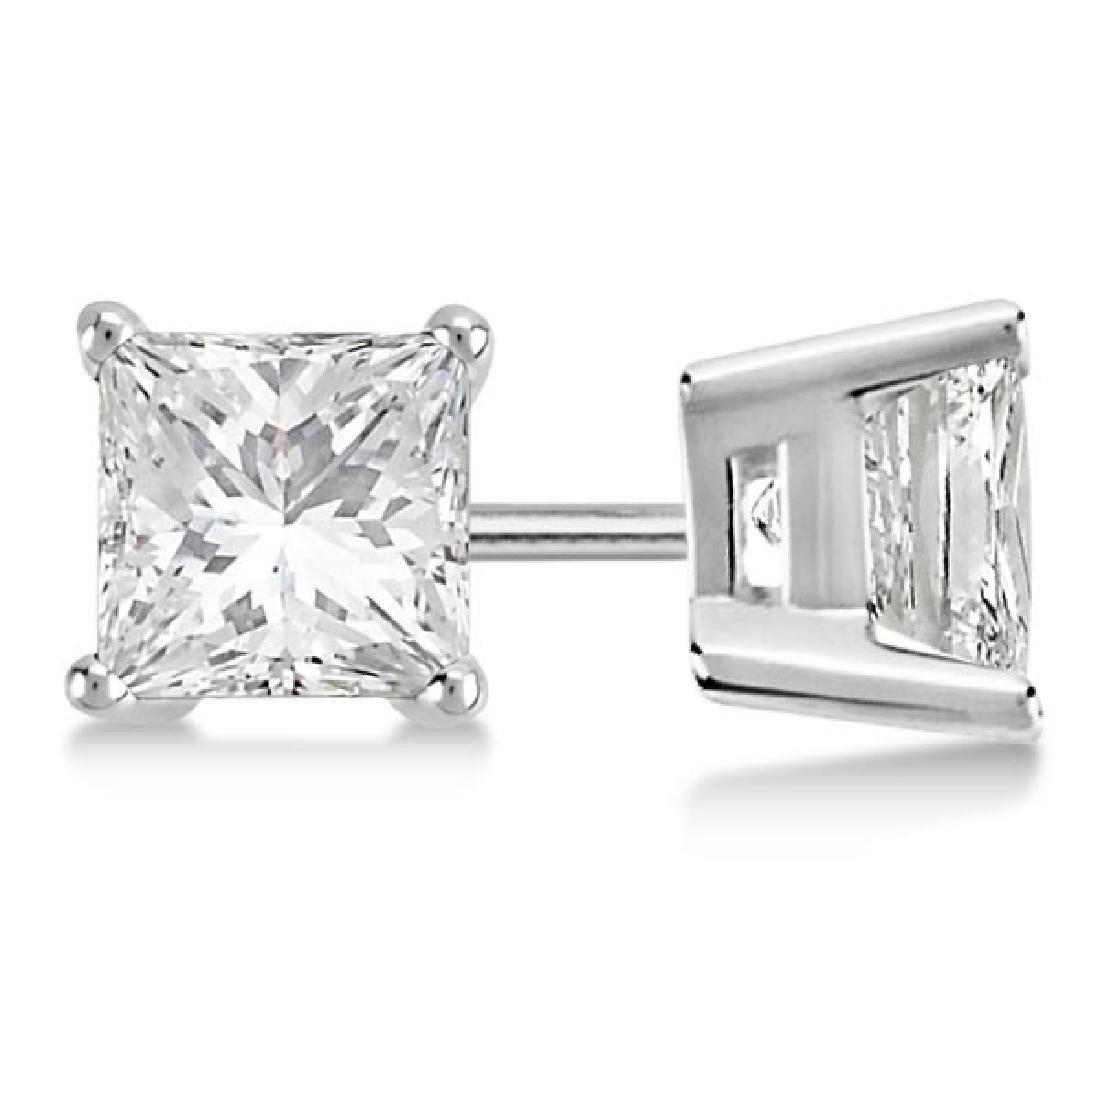 Certified 1.01 CTW Princess Diamond Stud Earrings G/SI2